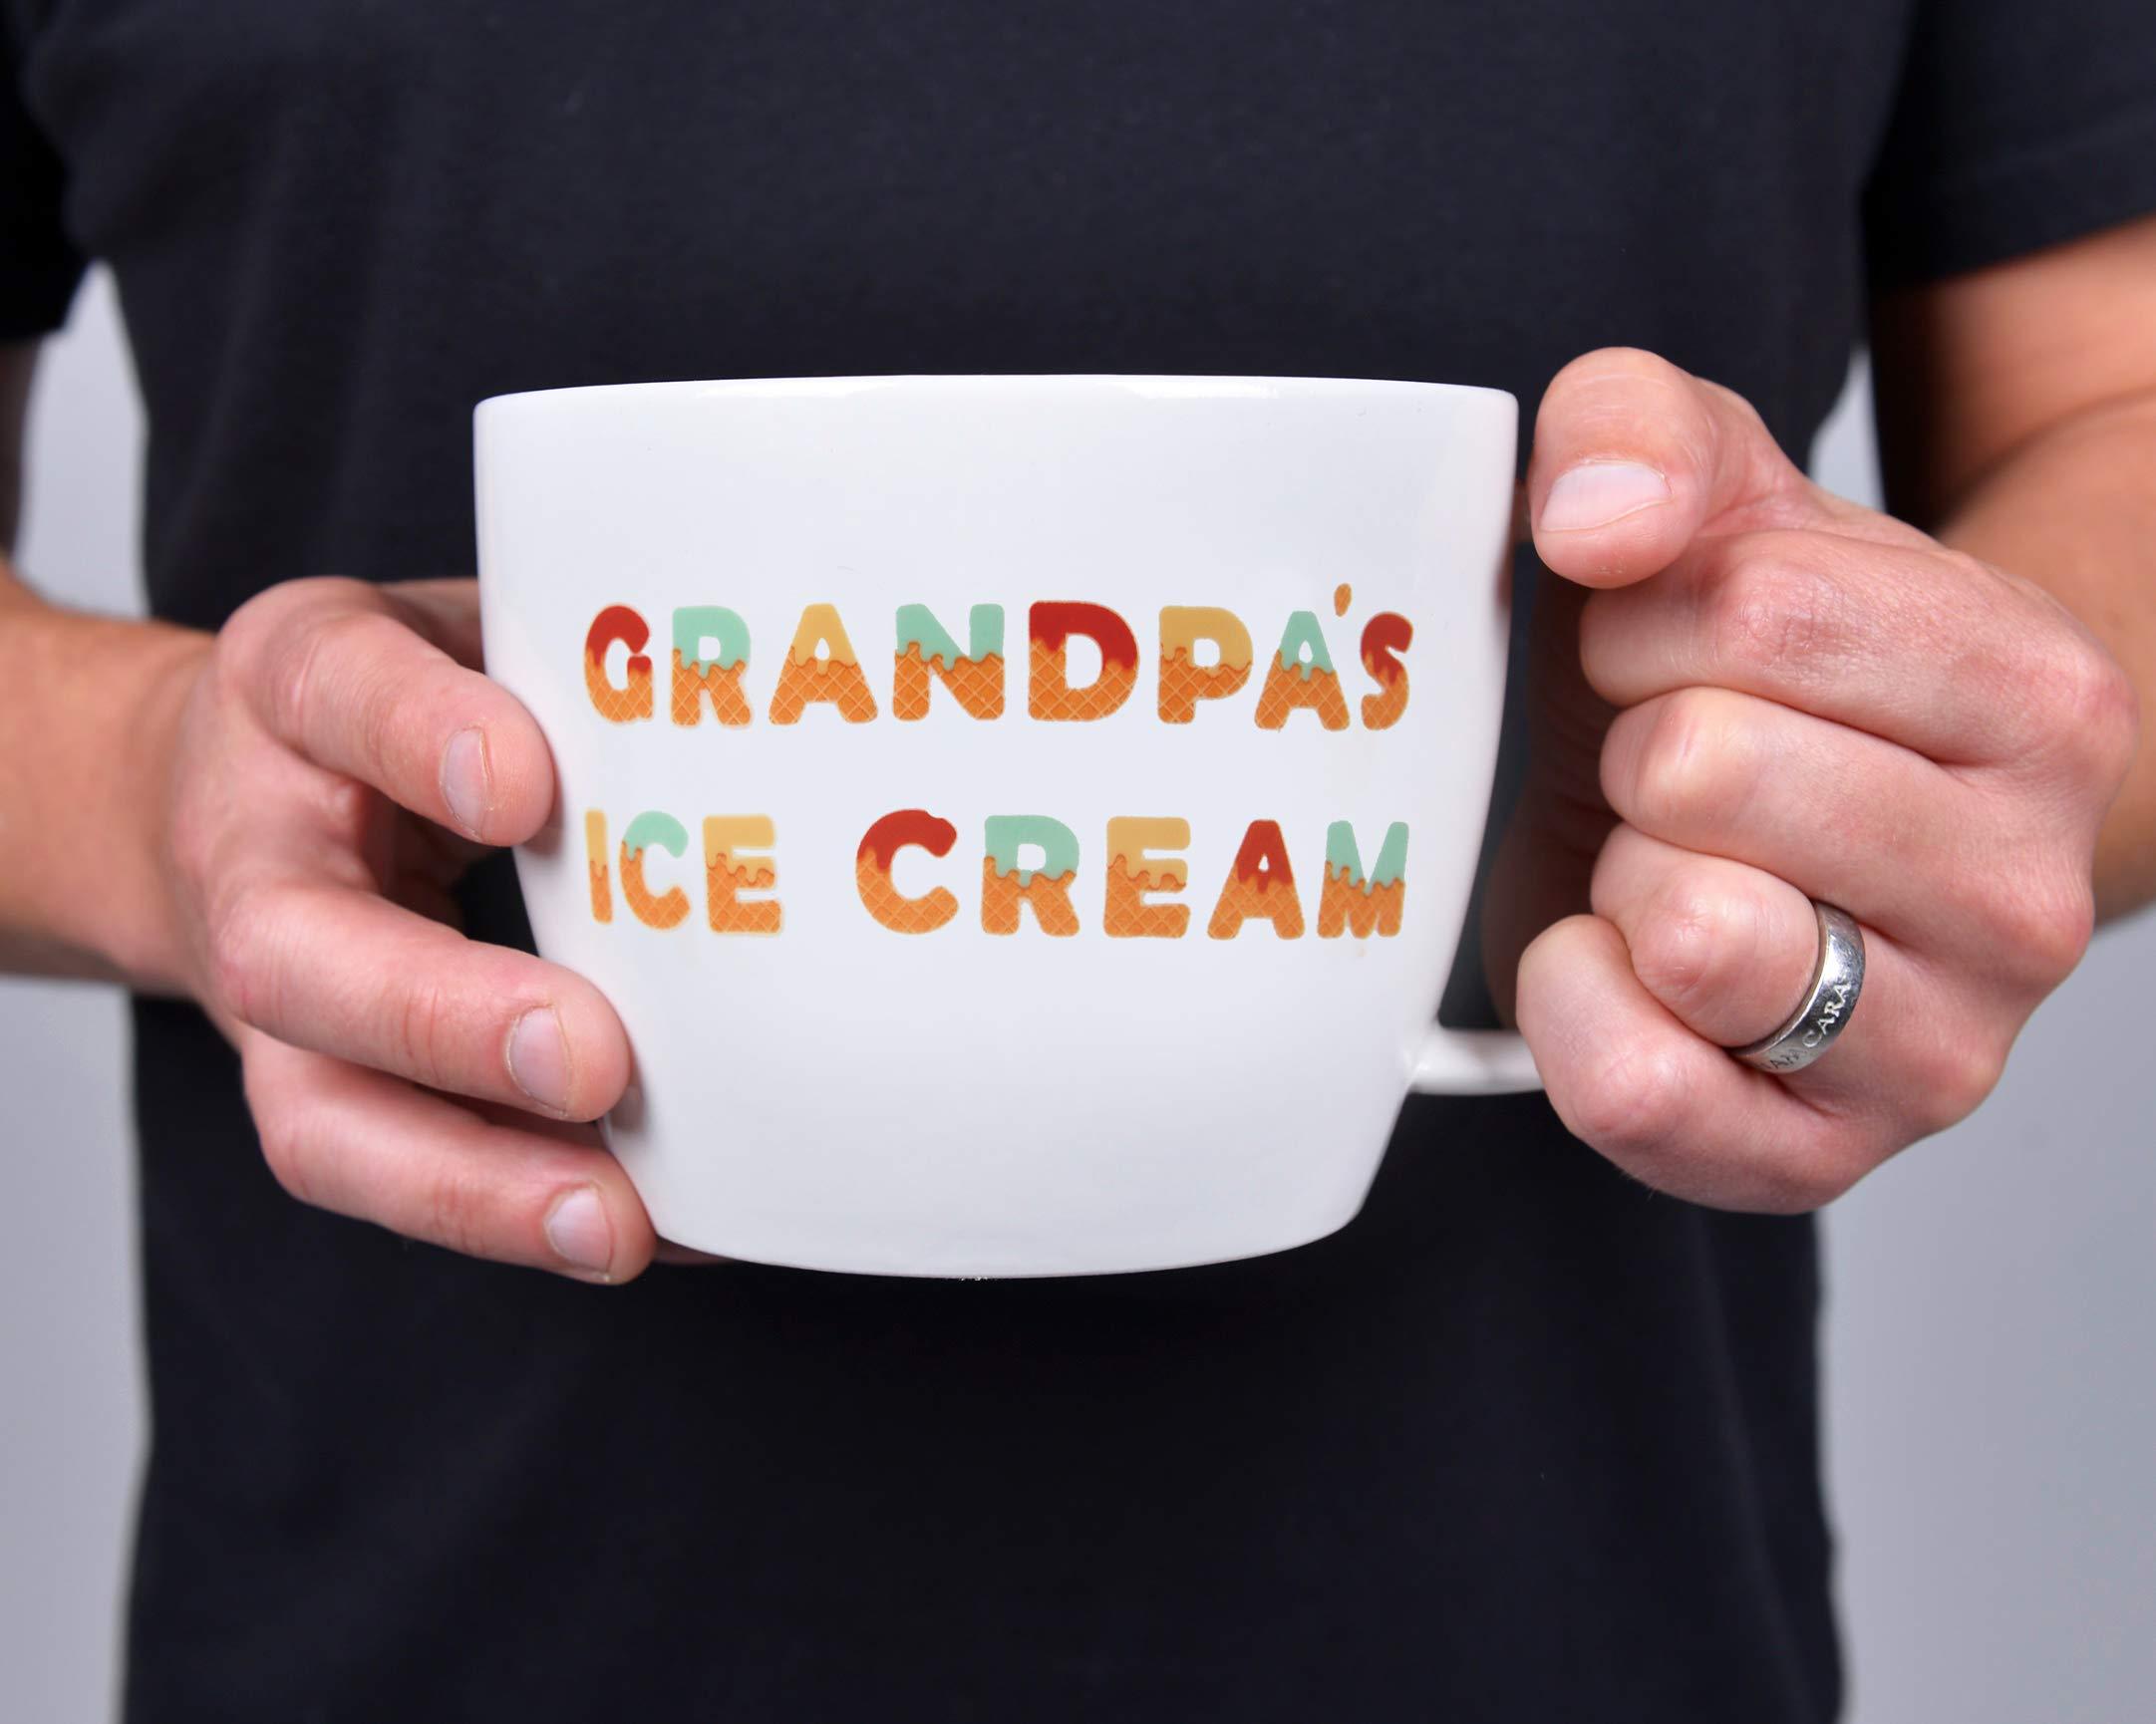 Josephine on Caffeine Gifts for Grandpa - Grandpa's Ice Cream Bowl and Engraved Spoon Grandpa's Ice Cream Shovel - Ideal or Birthday Gift by Josephine on Caffeine (Image #4)